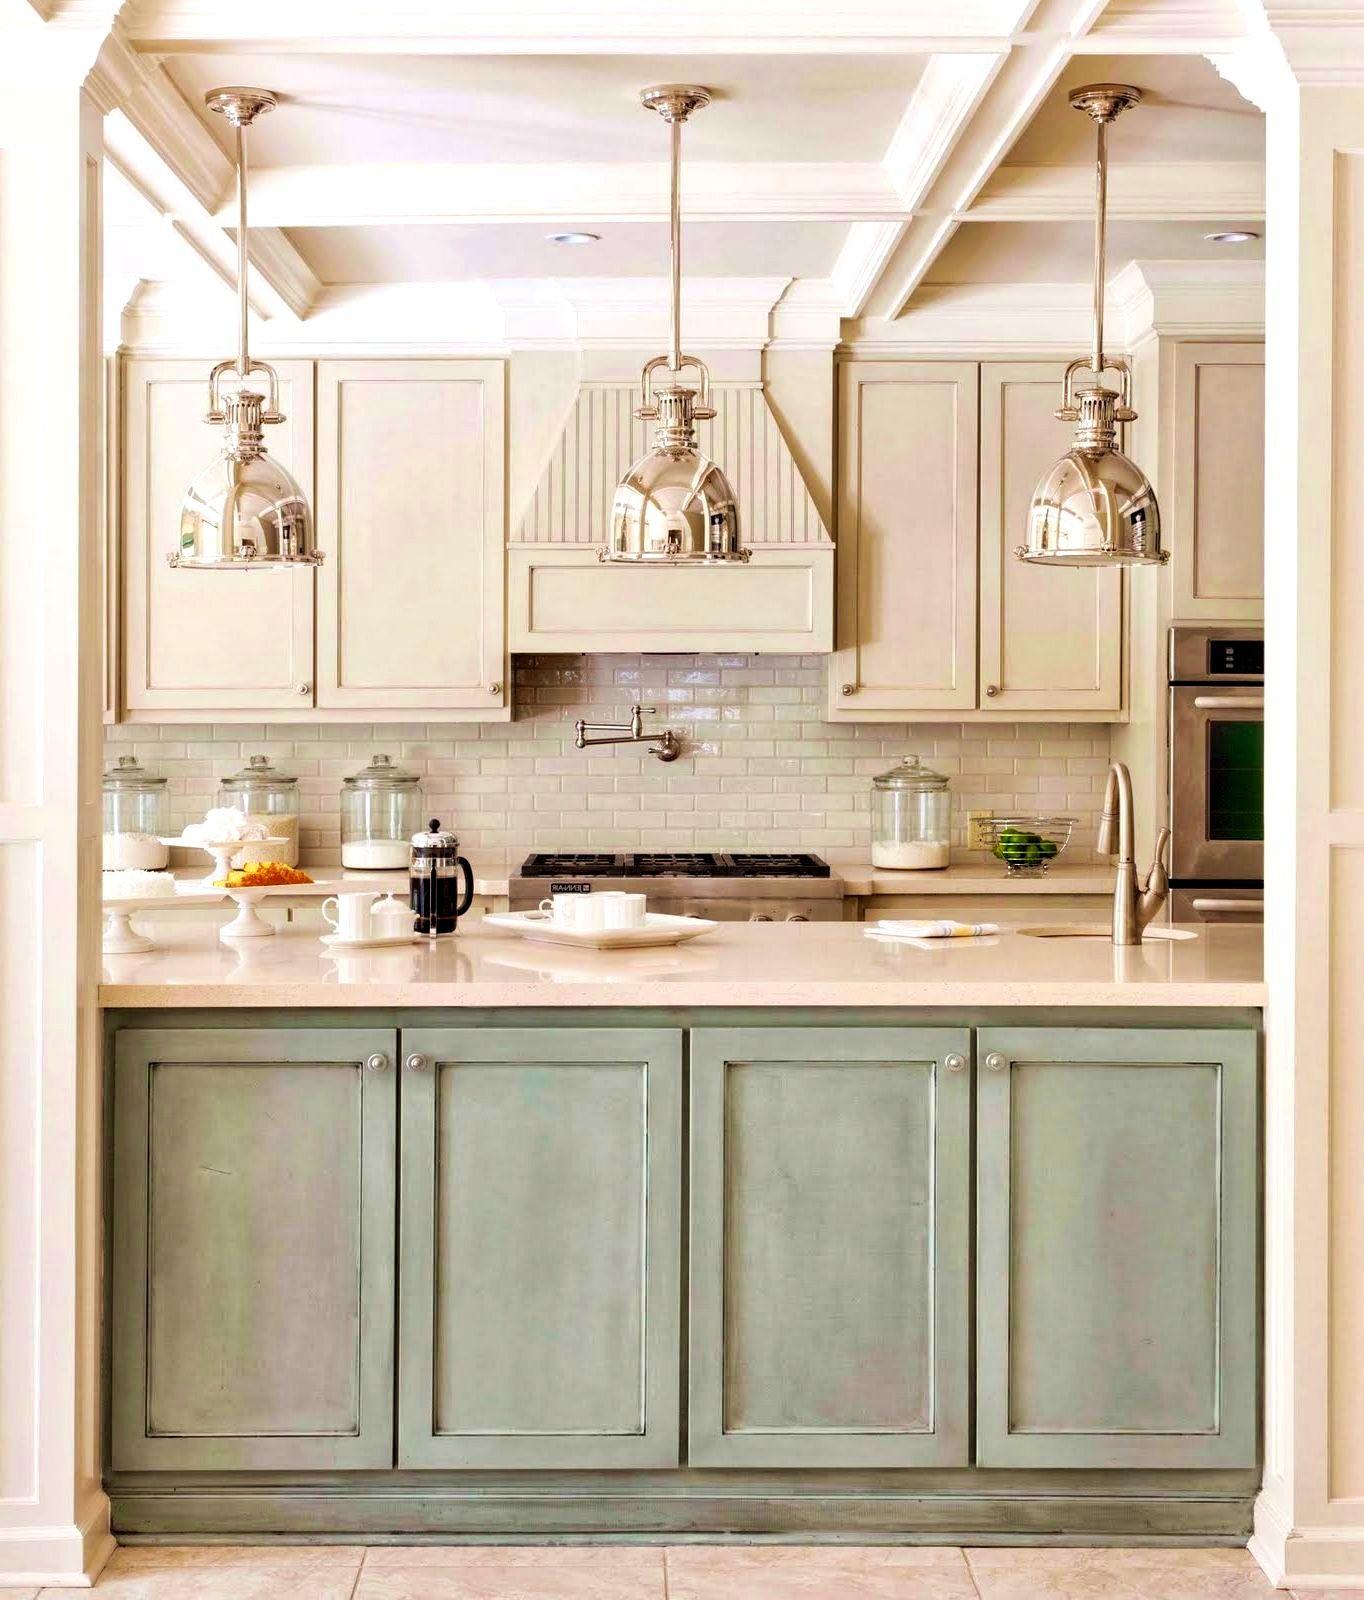 Modern Shabby Chic Kitchen Alluring Shabby Chic Kitchen Colour Scheme Resolution Kitchen Inspirations Kitchen Design Kitchen Remodel